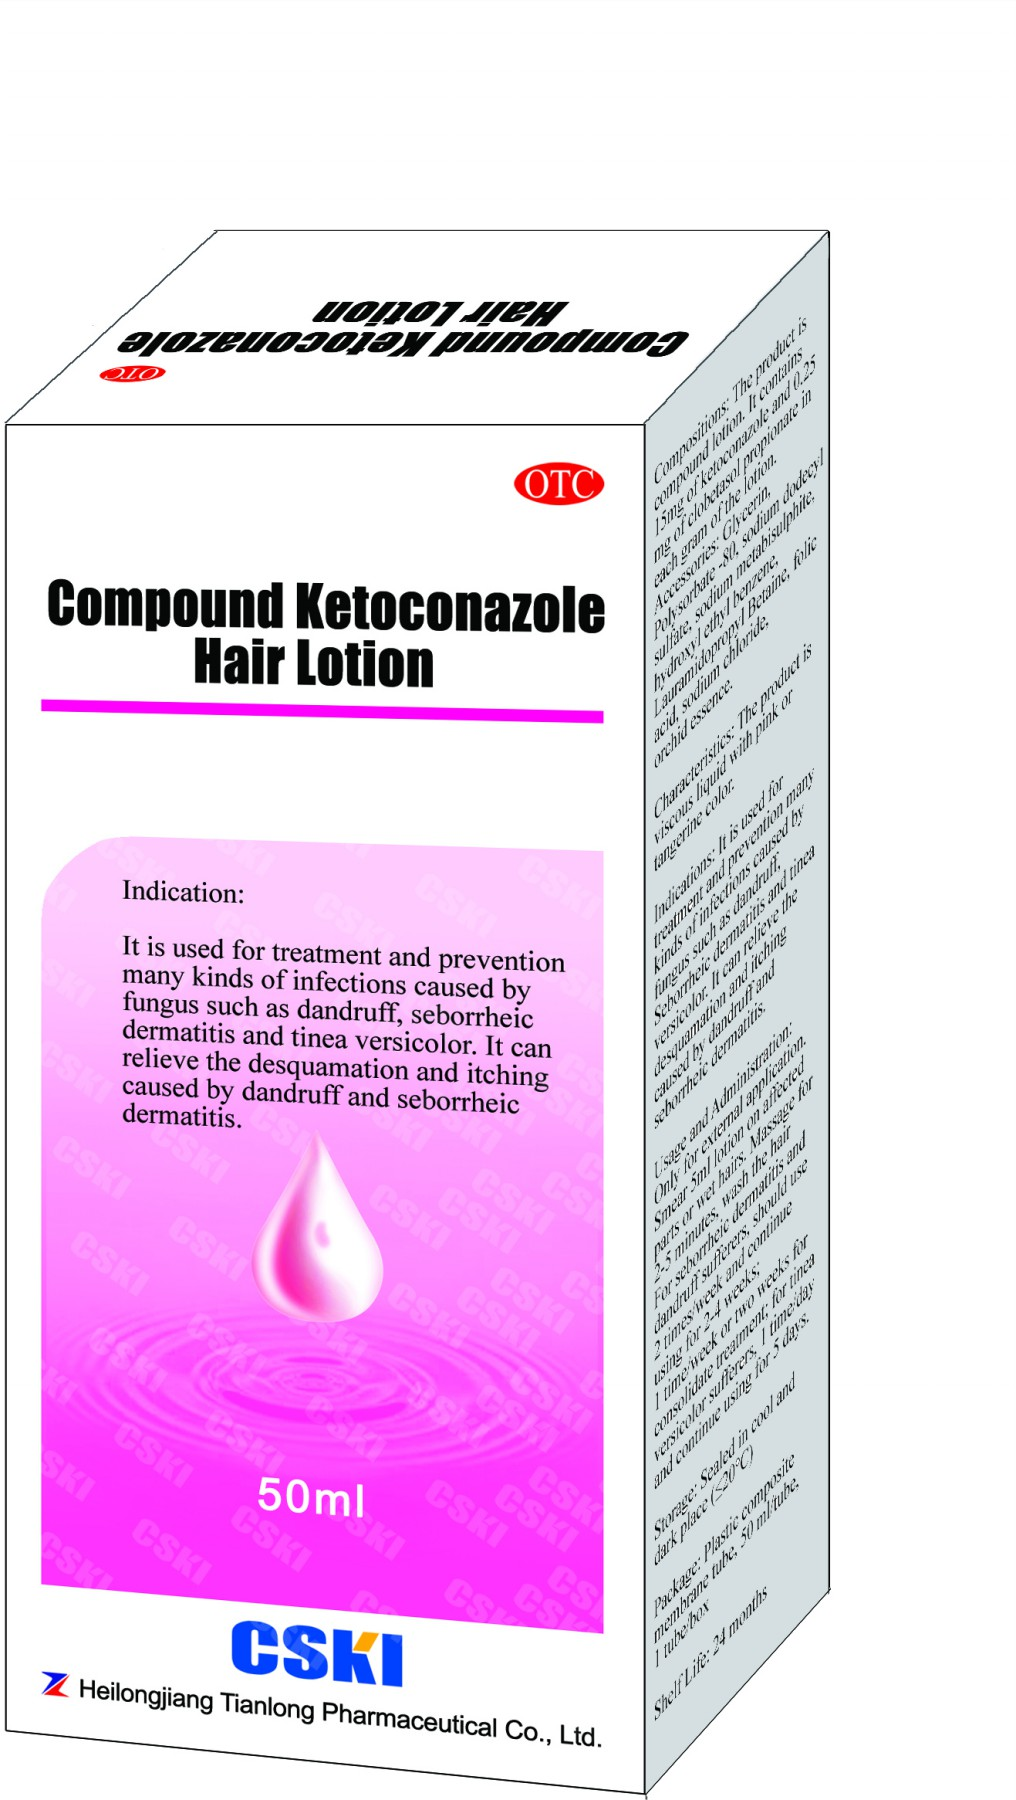 Hair lontion for dandruff, capitis pityriasis, seborrheic dermatitis and chromophytosis